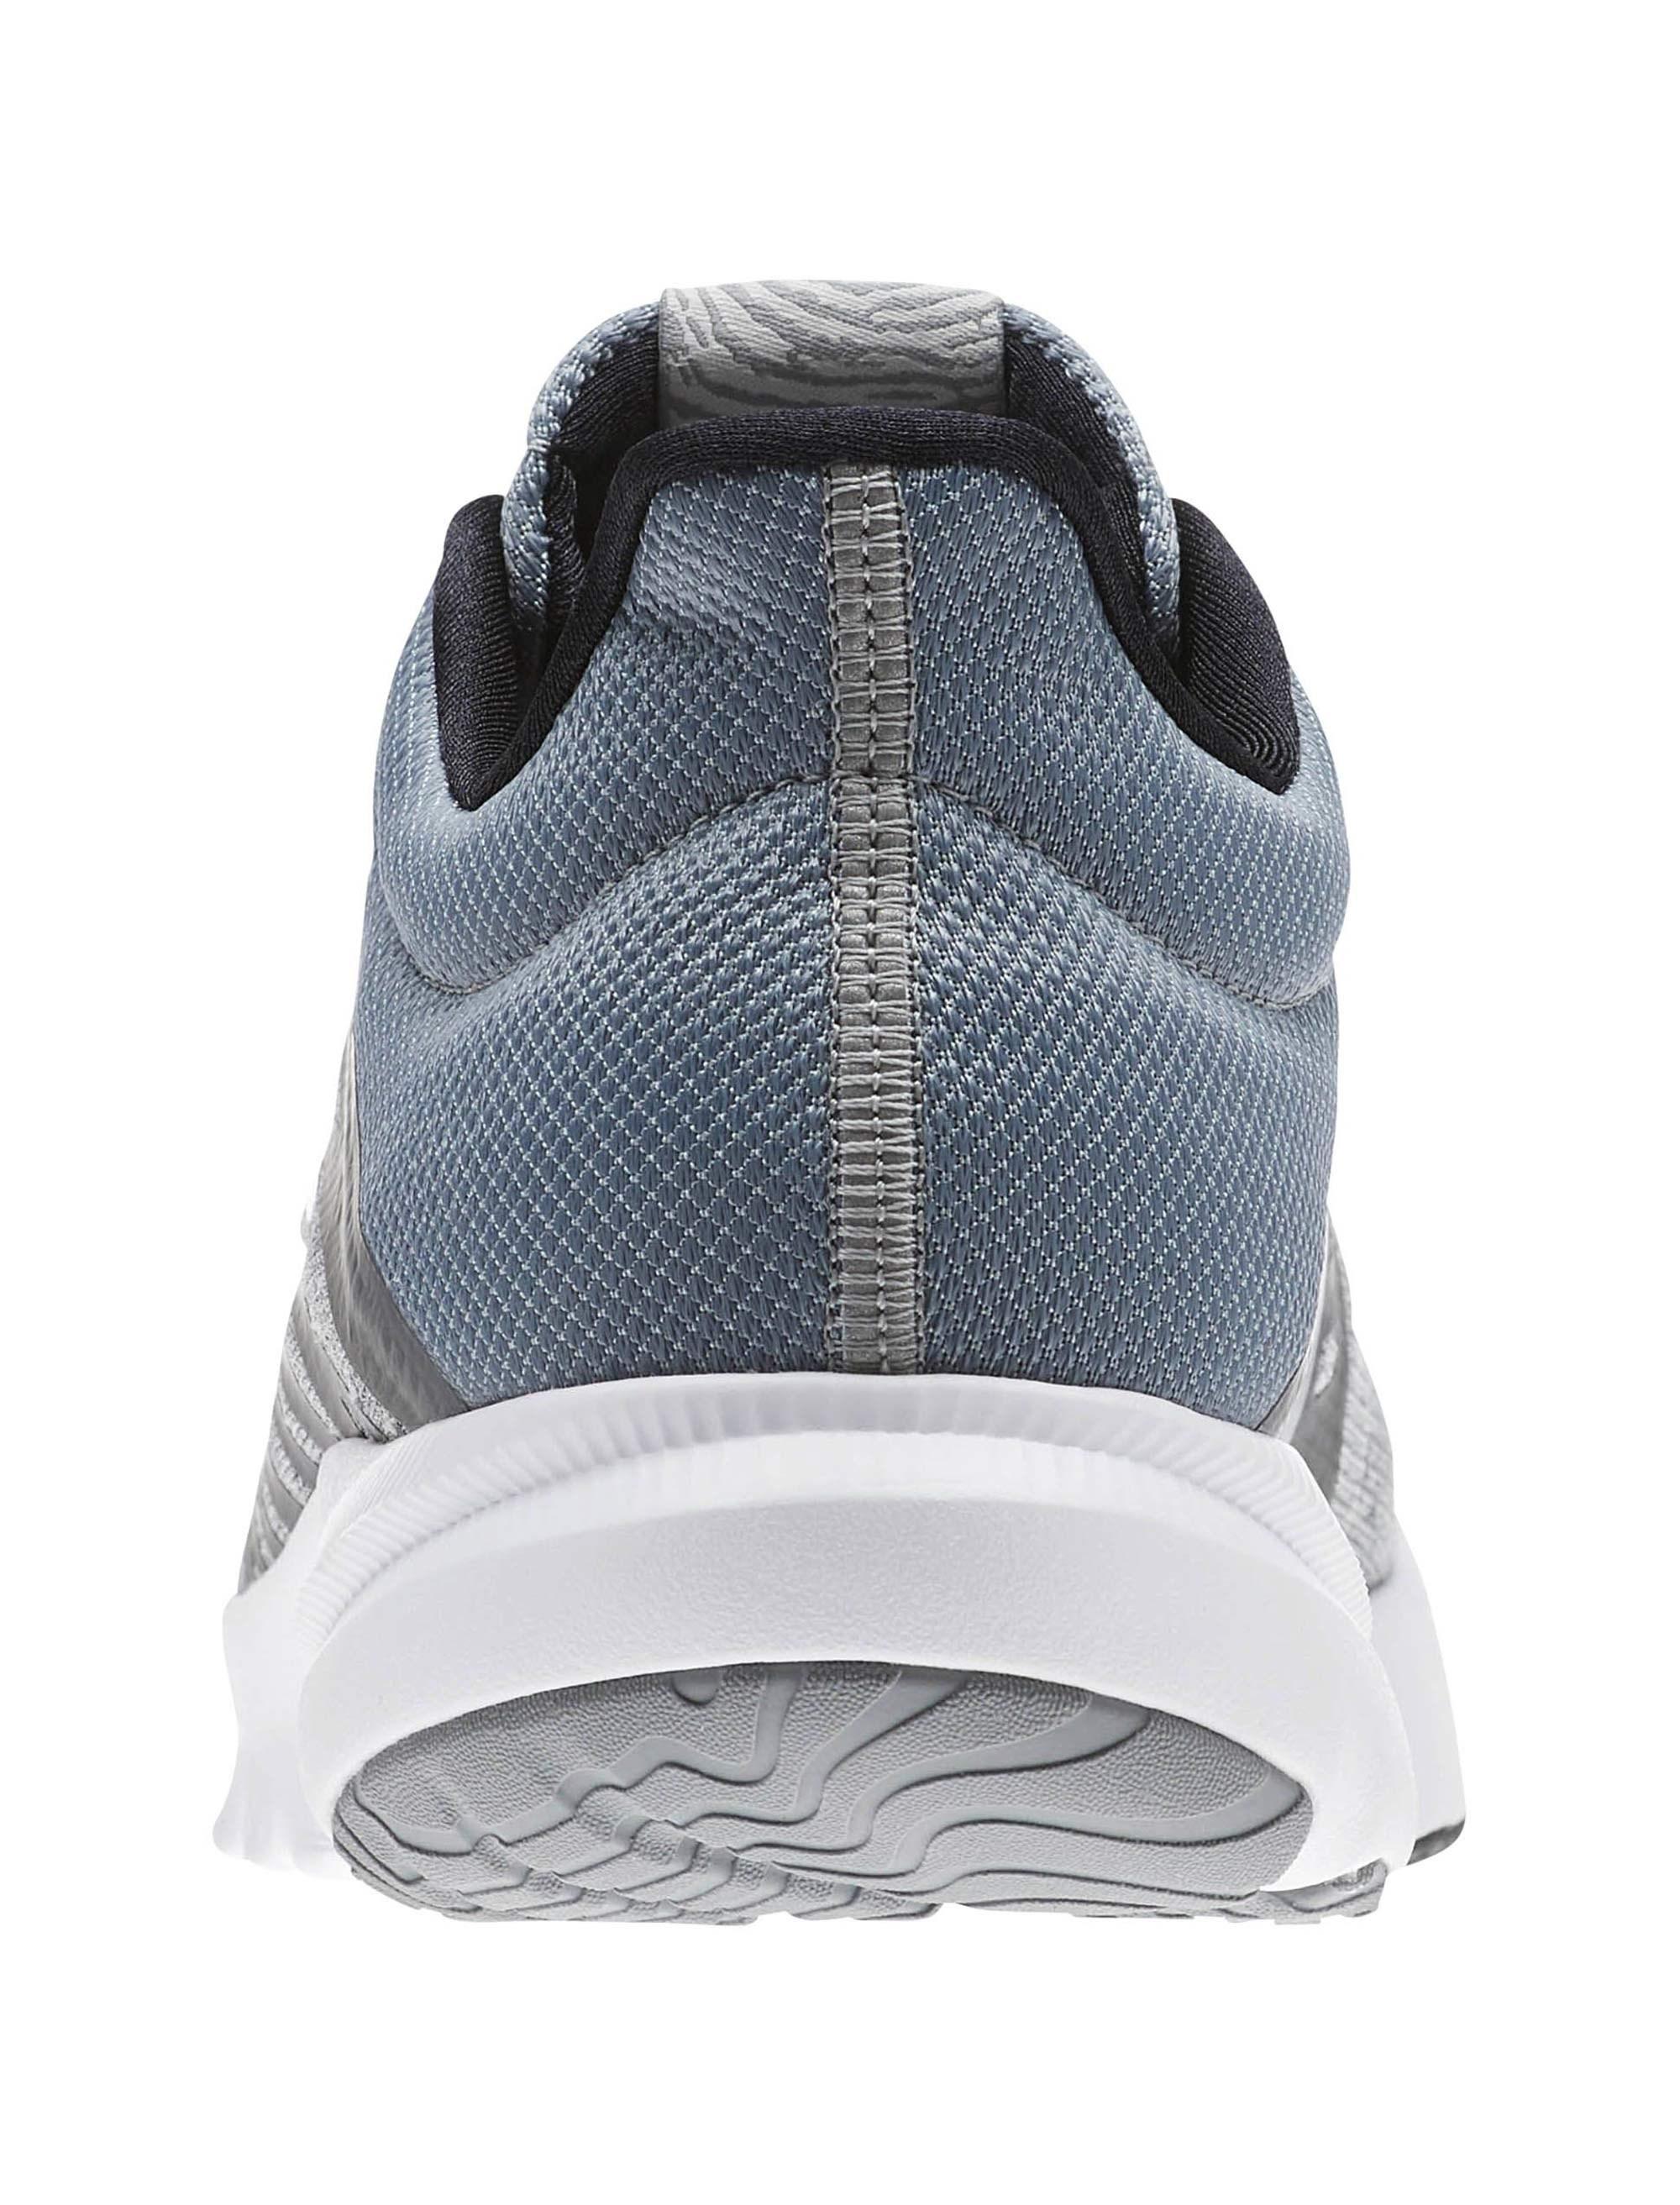 کفش دویدن بندی مردانه OSR Distance 3-0 - طوسي - 6